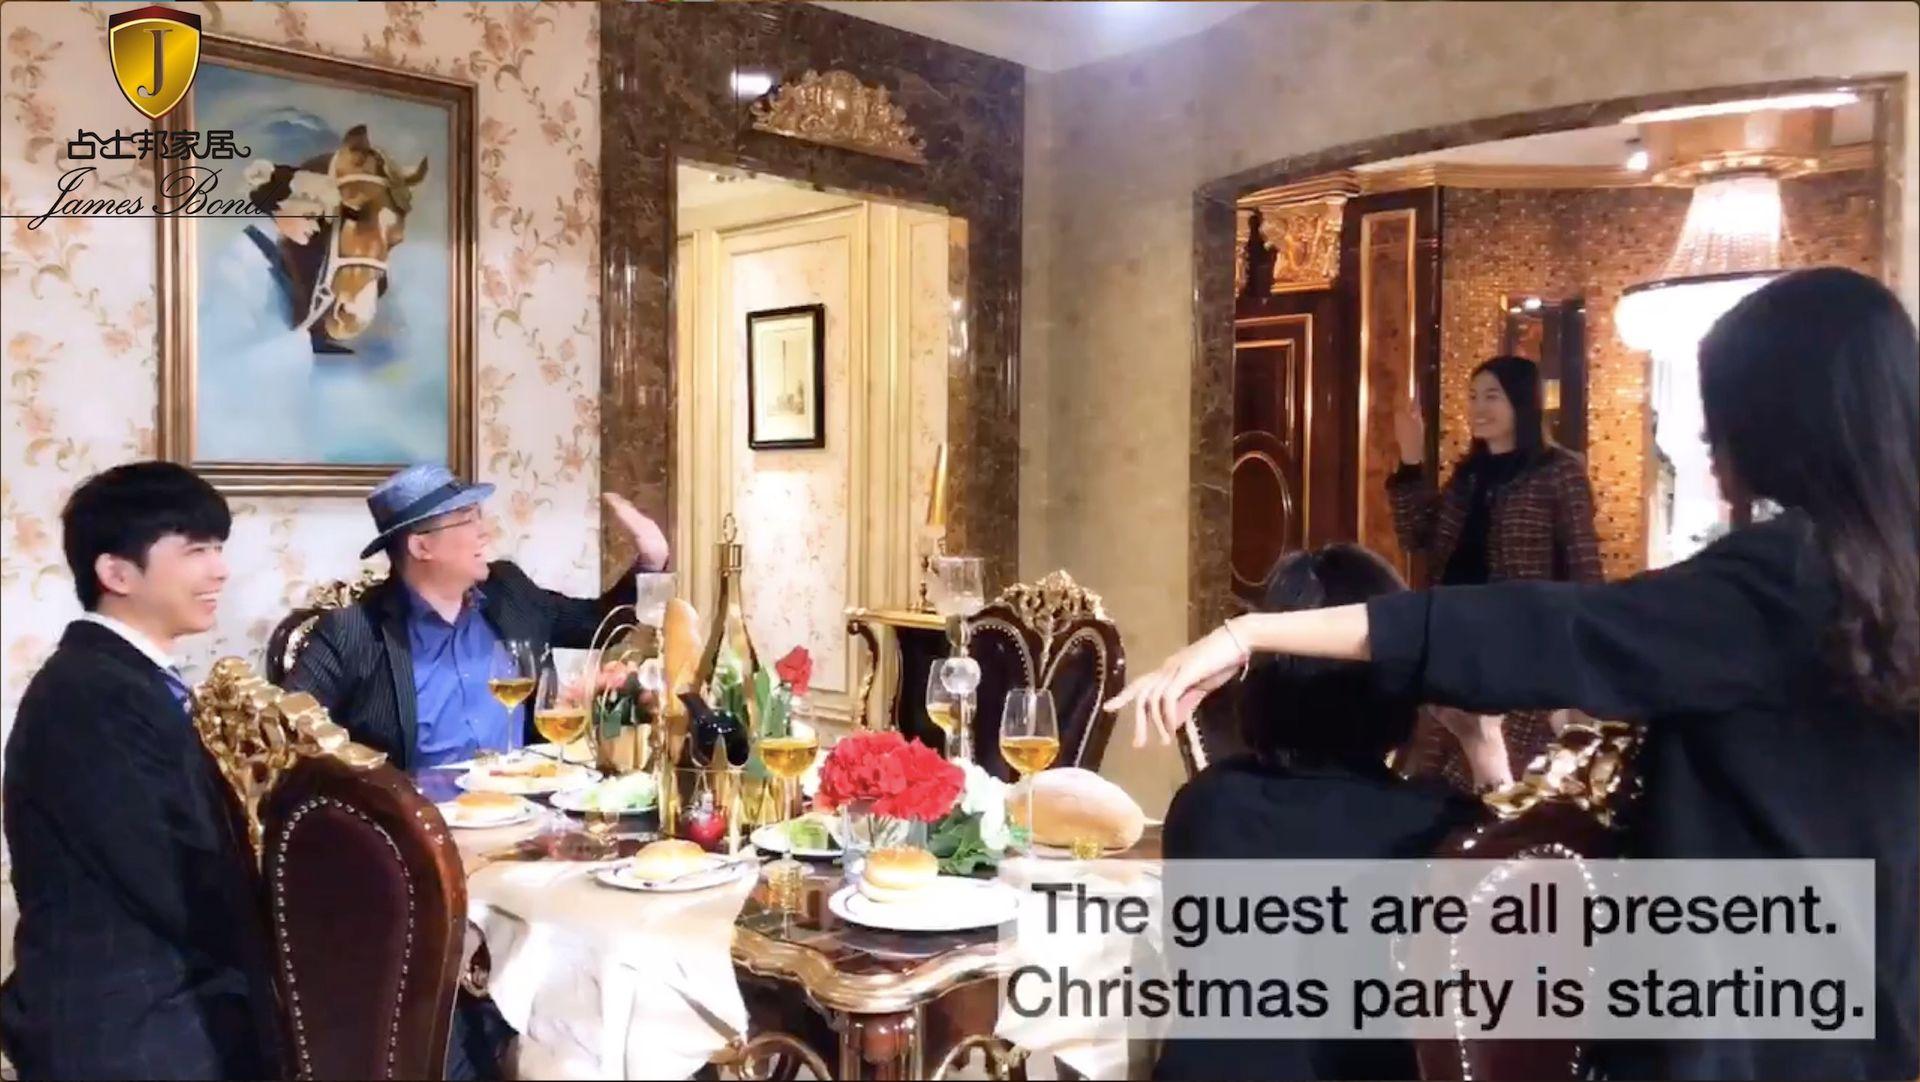 Amazing Christmas feast on James Bond classic dining set.